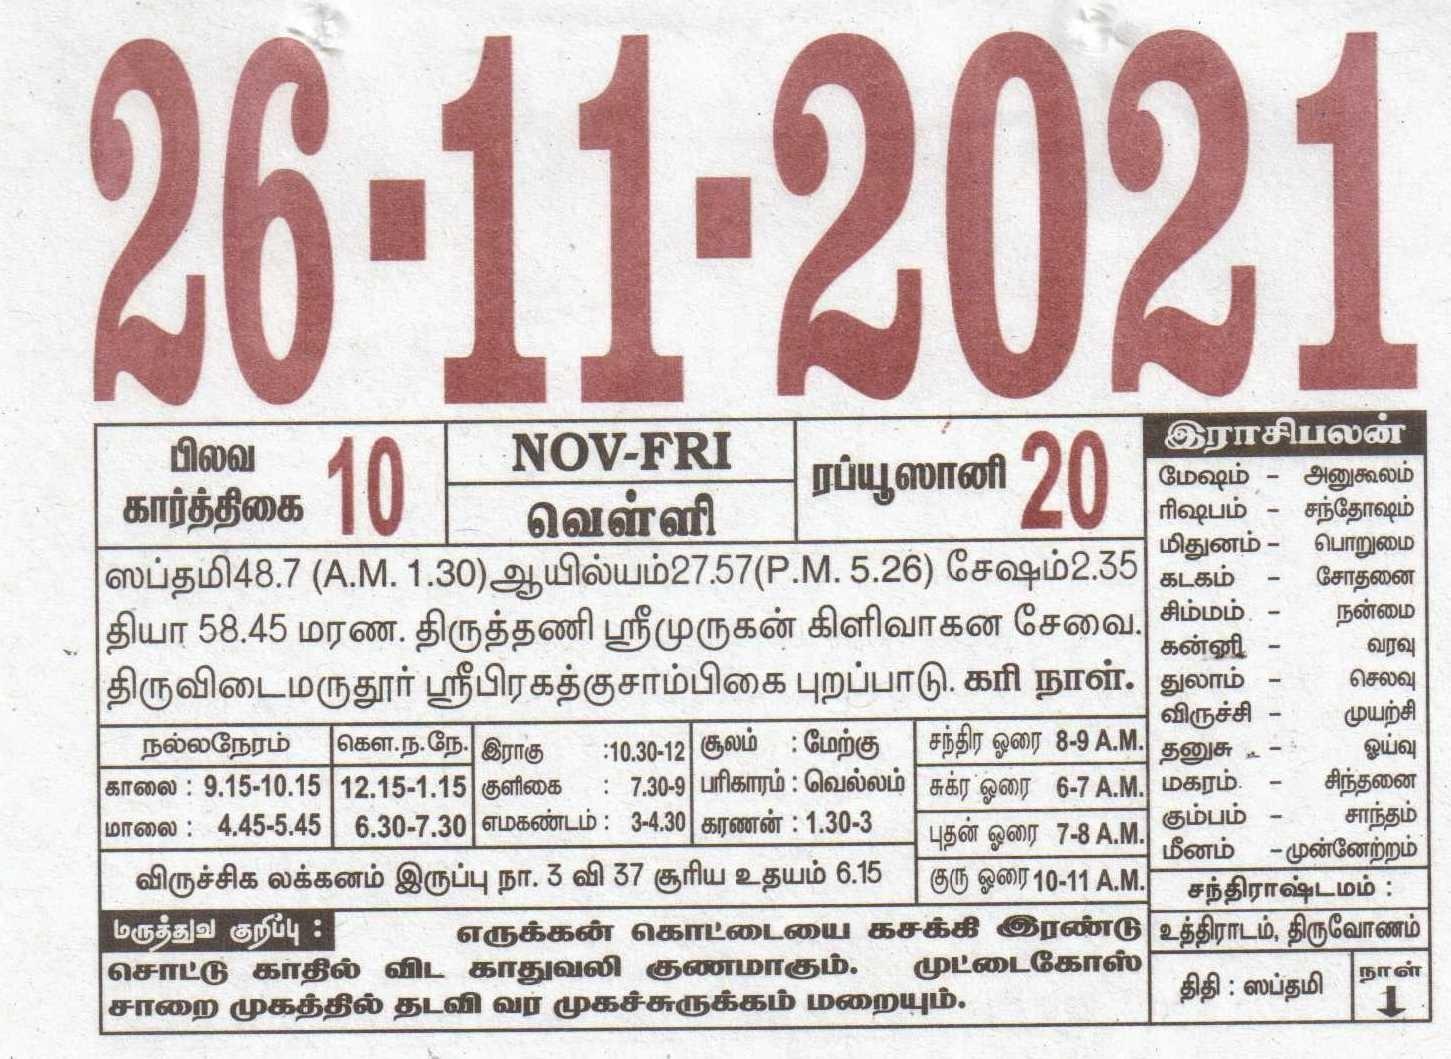 26-11-2021 Daily Calendar | Date 26 , January Daily Tear Off Calendar | Daily Panchangam Rasi Palan August 2021 Tamil Daily Calendar